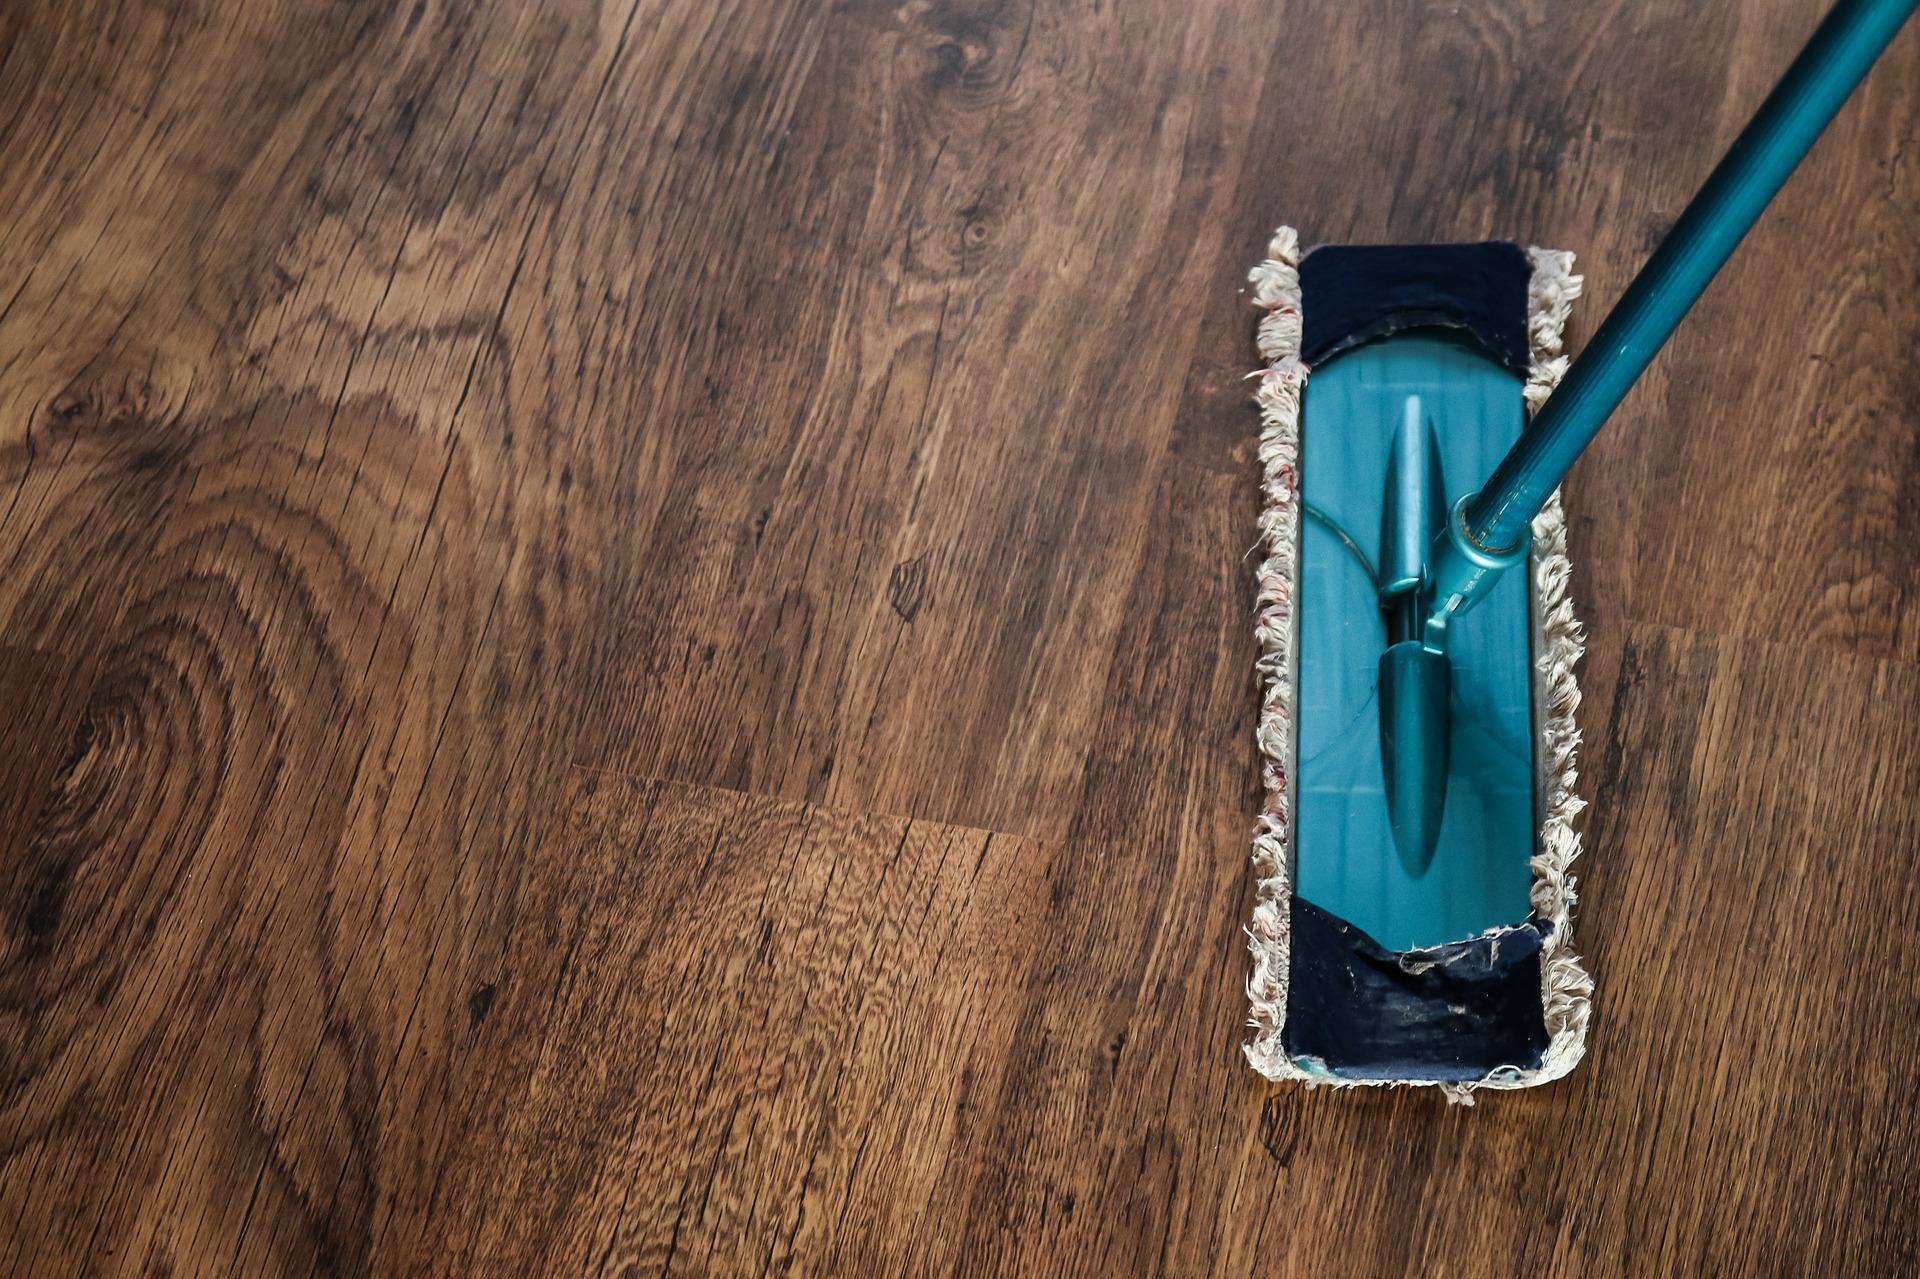 Cleaning a hardwood floor